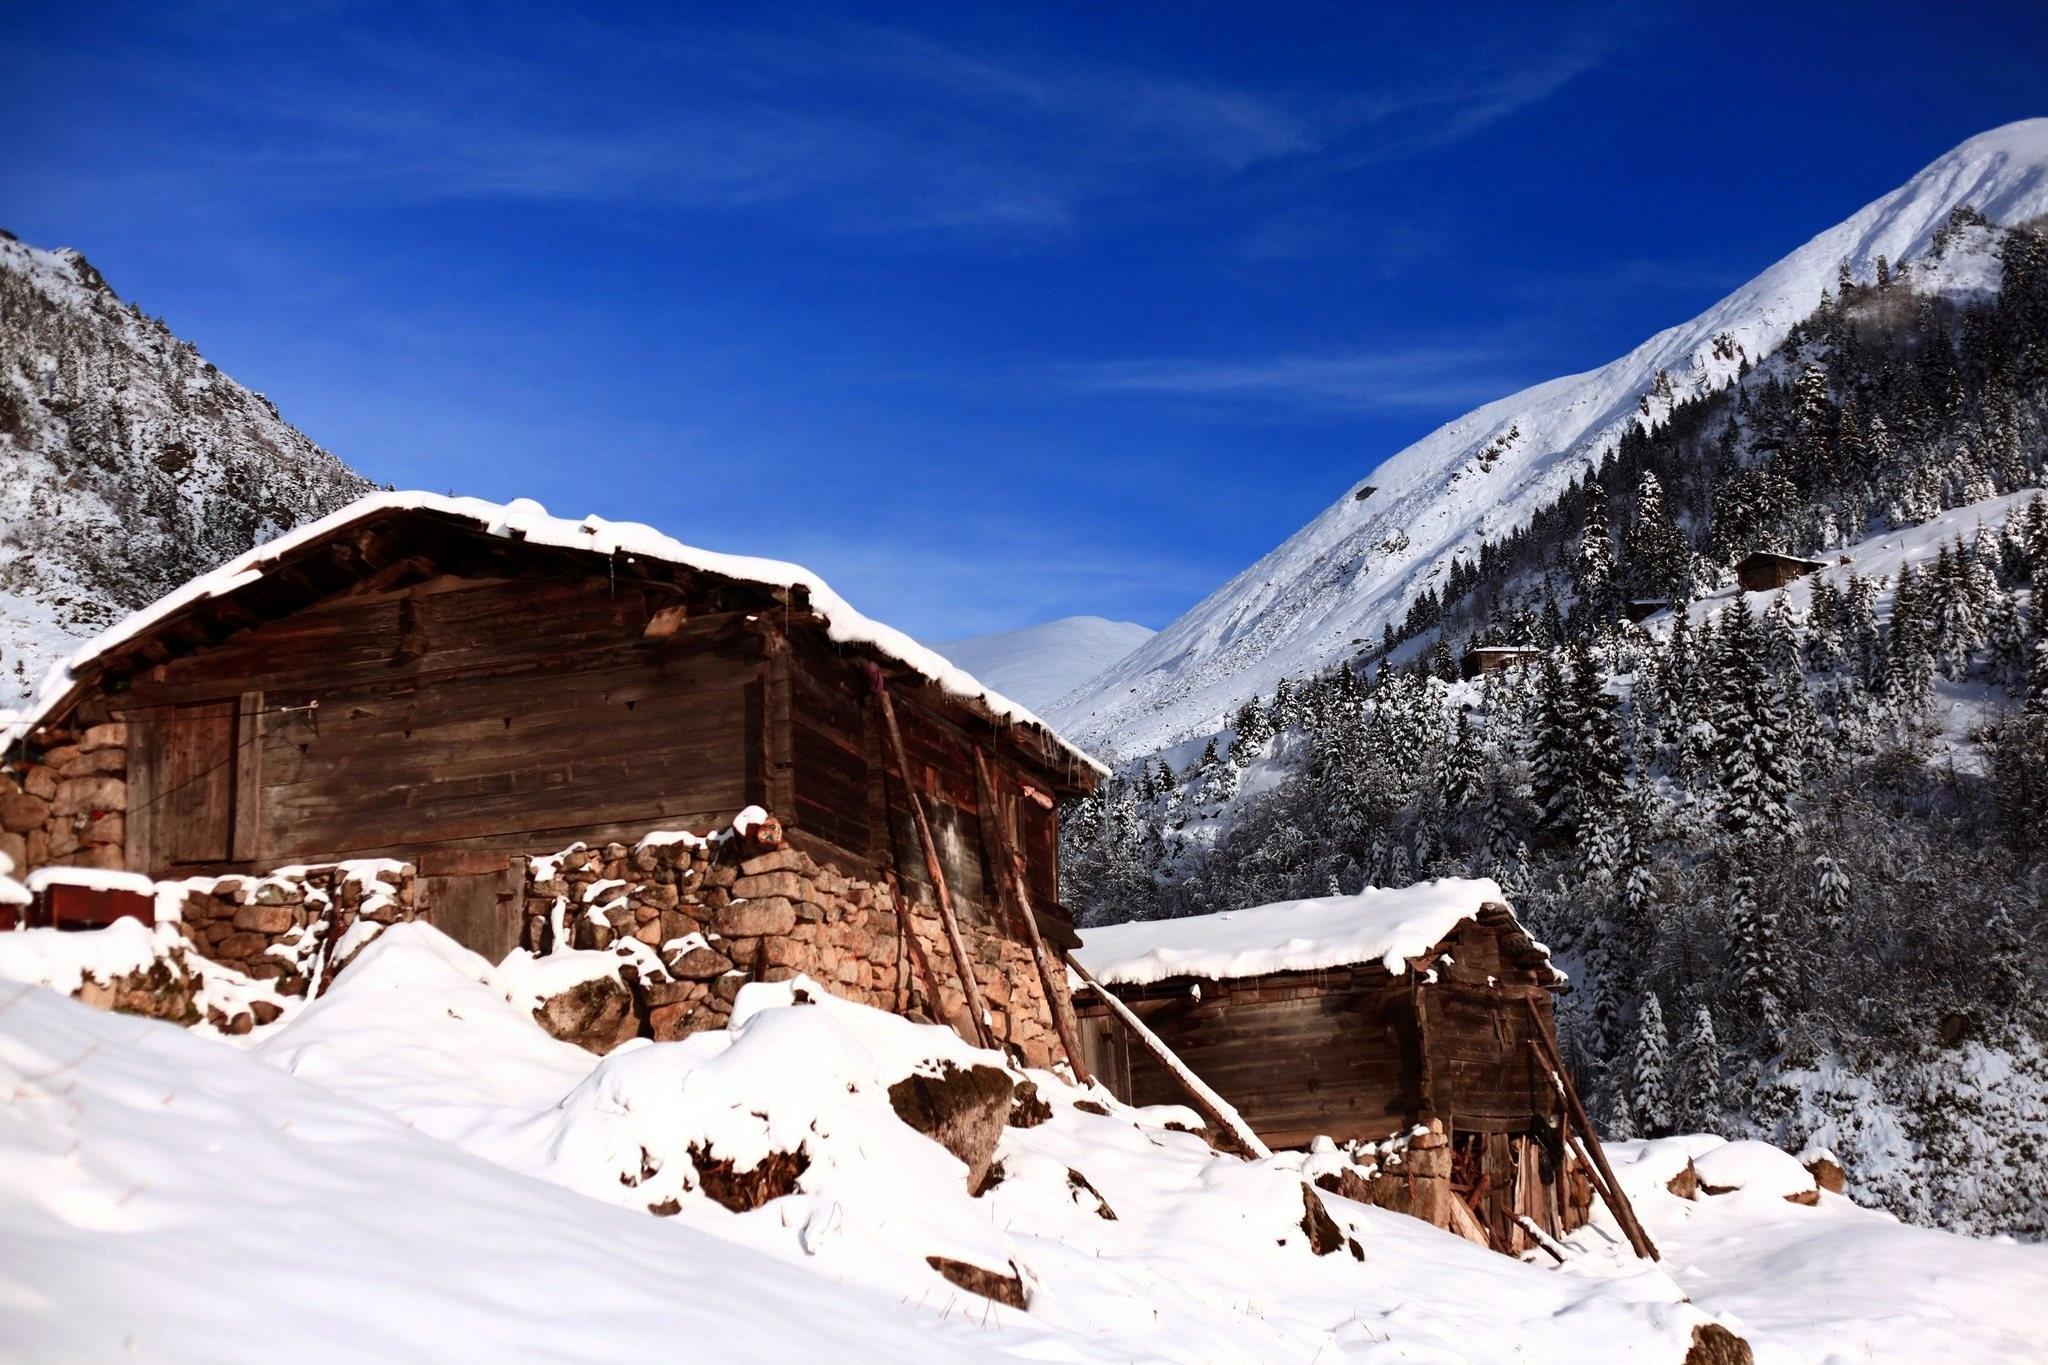 The foothills of Kau00e7kar Mountains